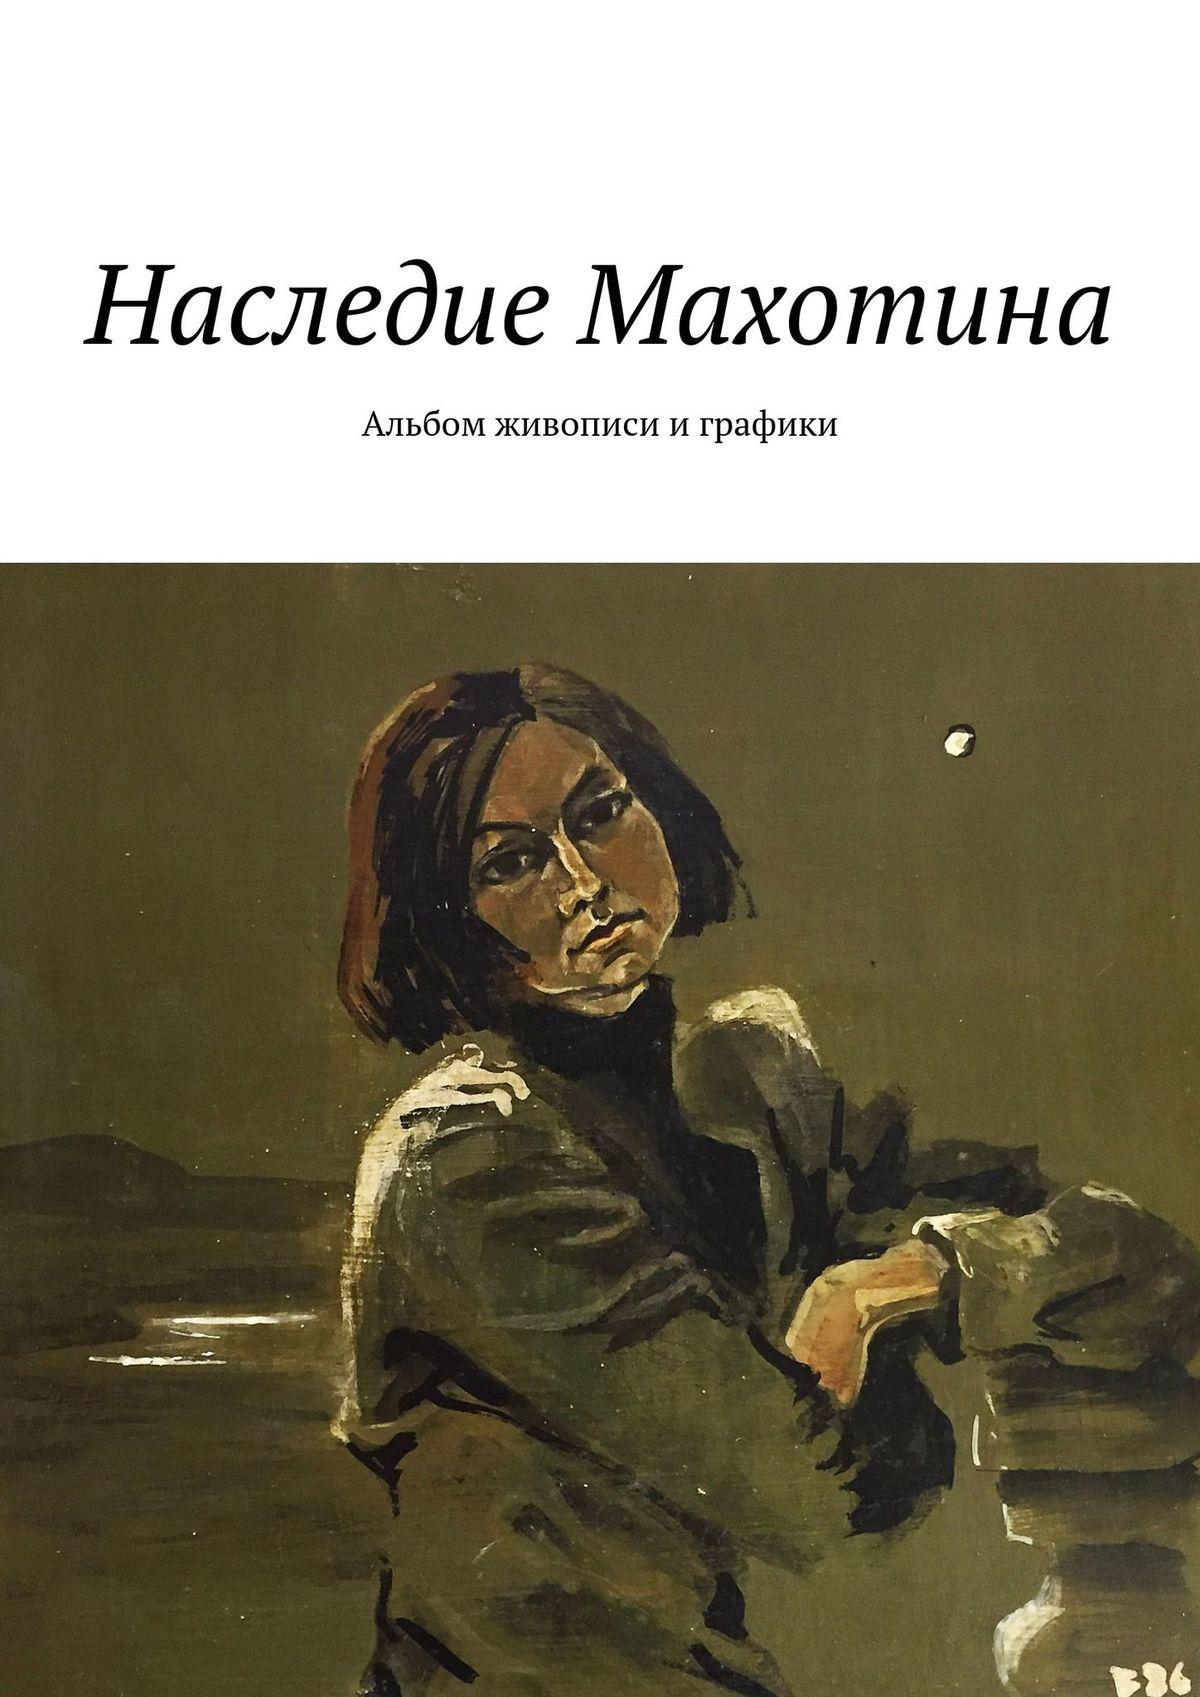 Светлана Абакумова Виктор Махотин (1946 – 2002). Наследие Махотина. Альбом живописи играфики цены онлайн